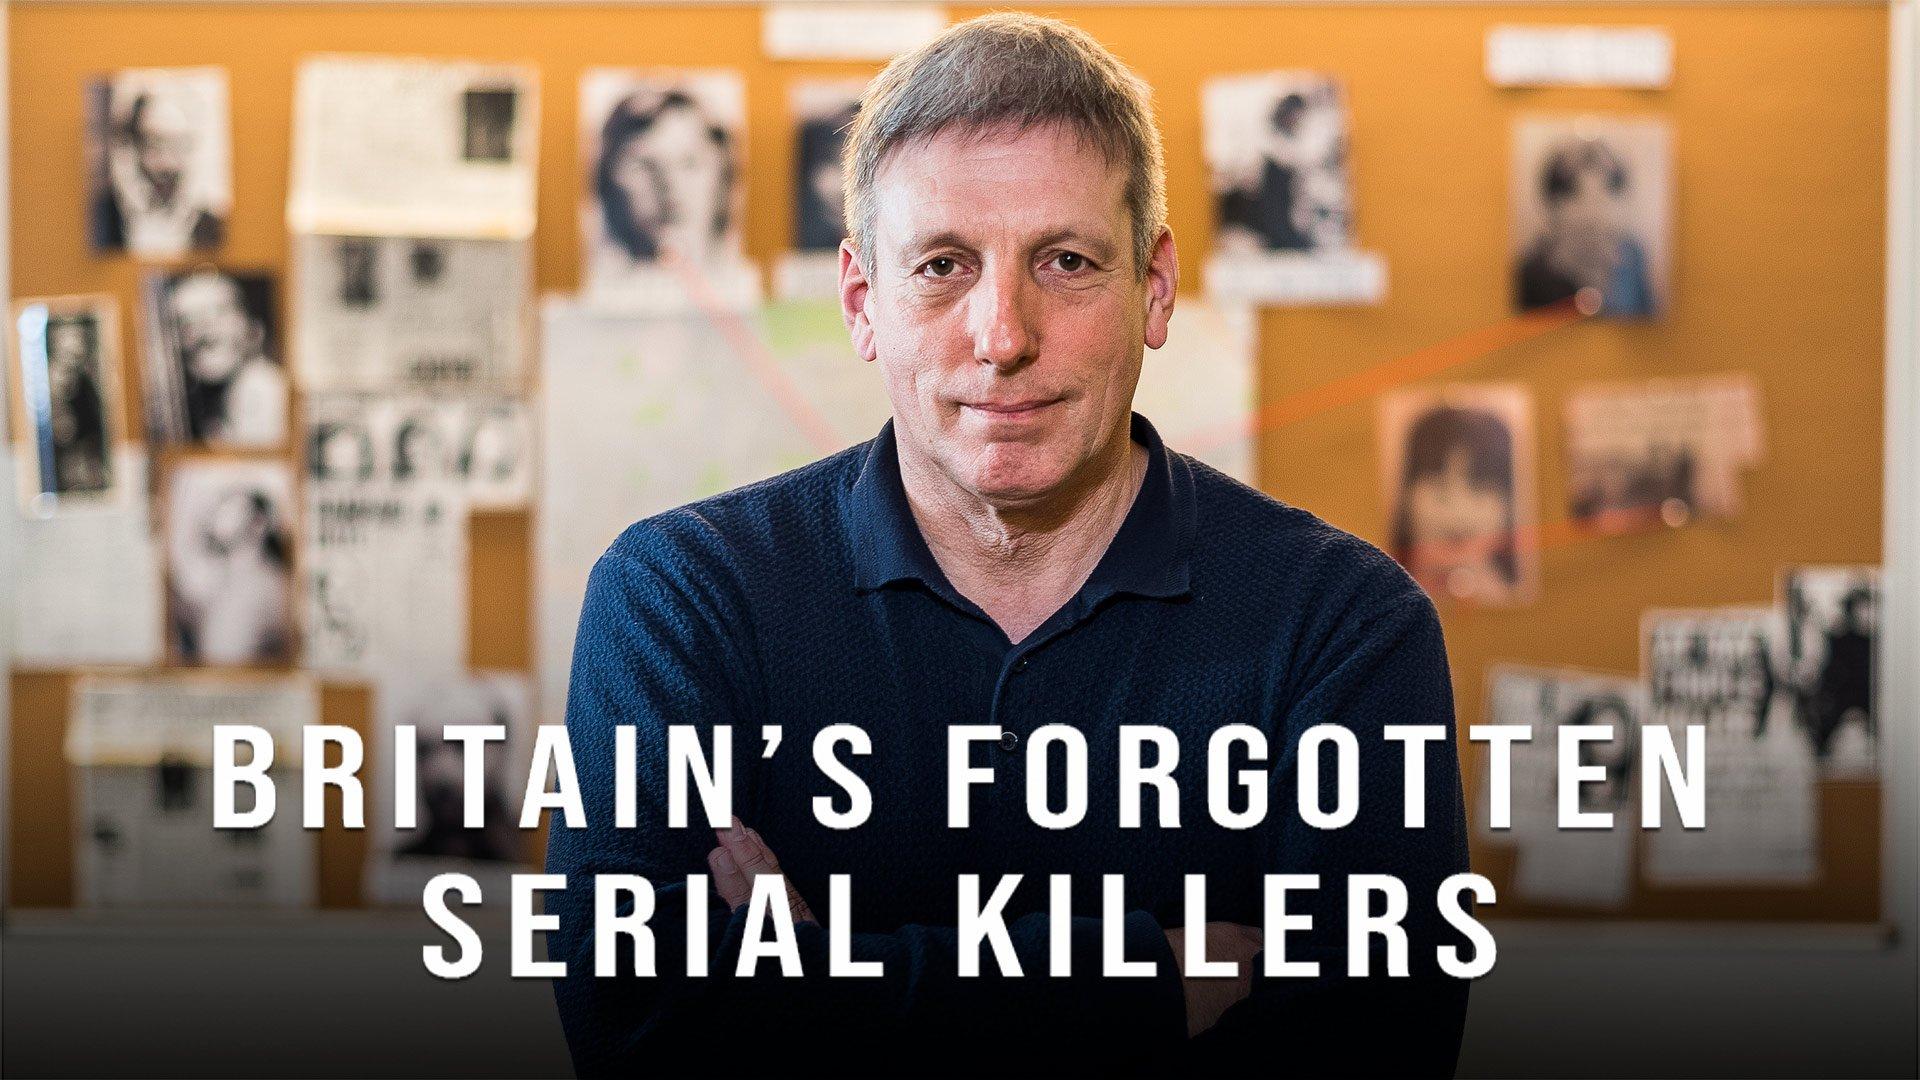 Britain's Forgotten Serial Killer on BritBox UK